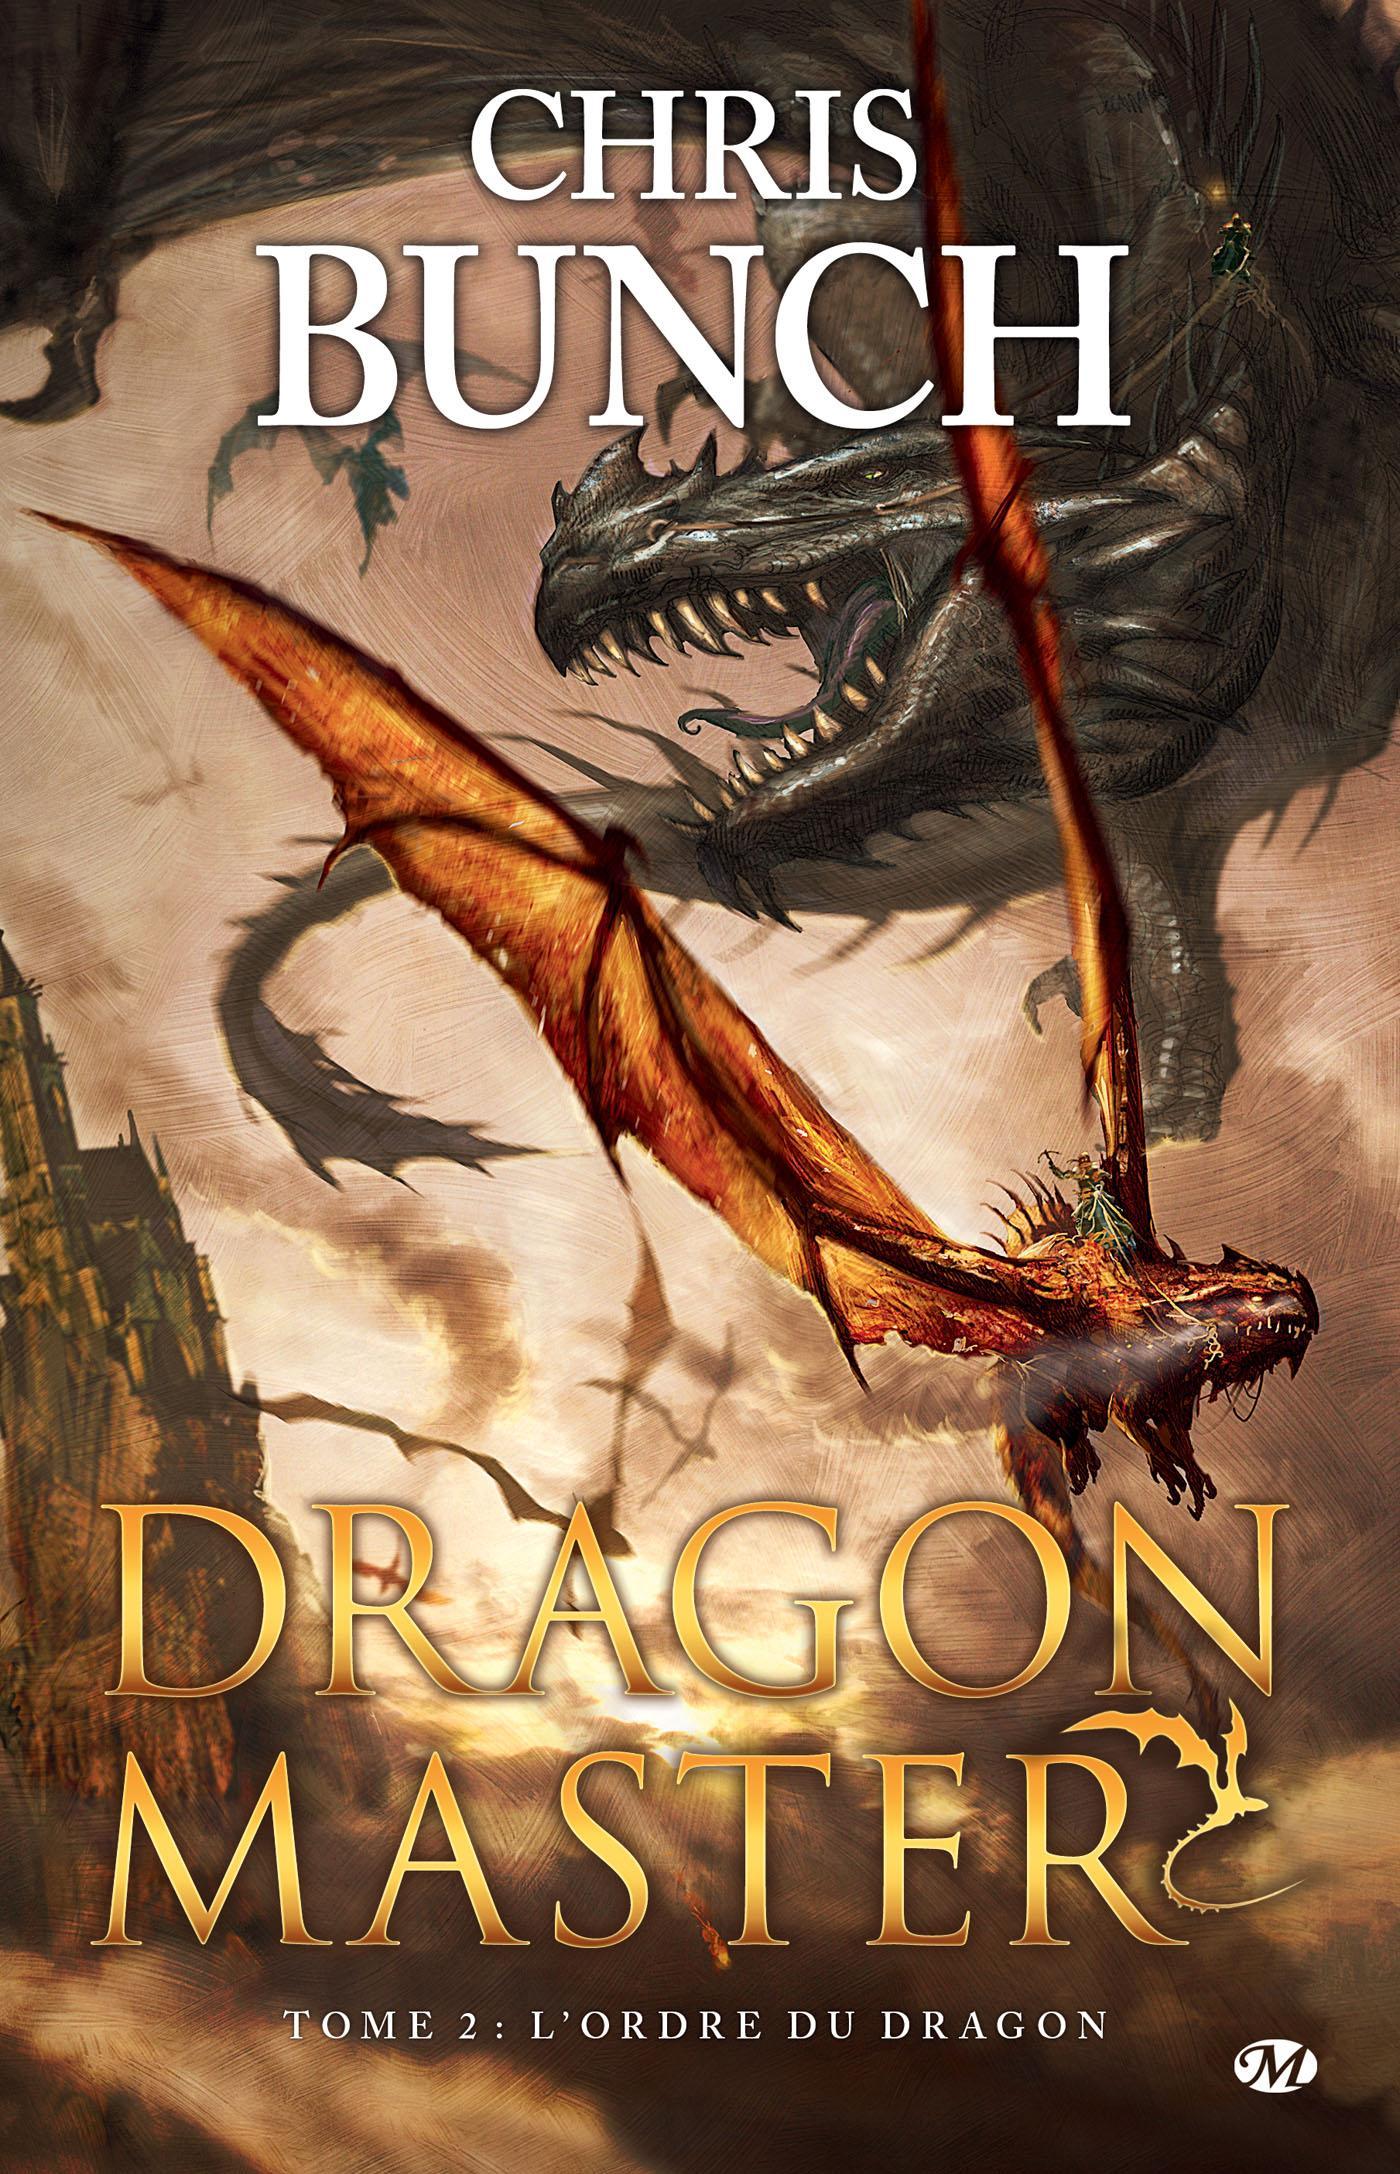 L'Ordre du dragon, DRAGON MASTER, T2